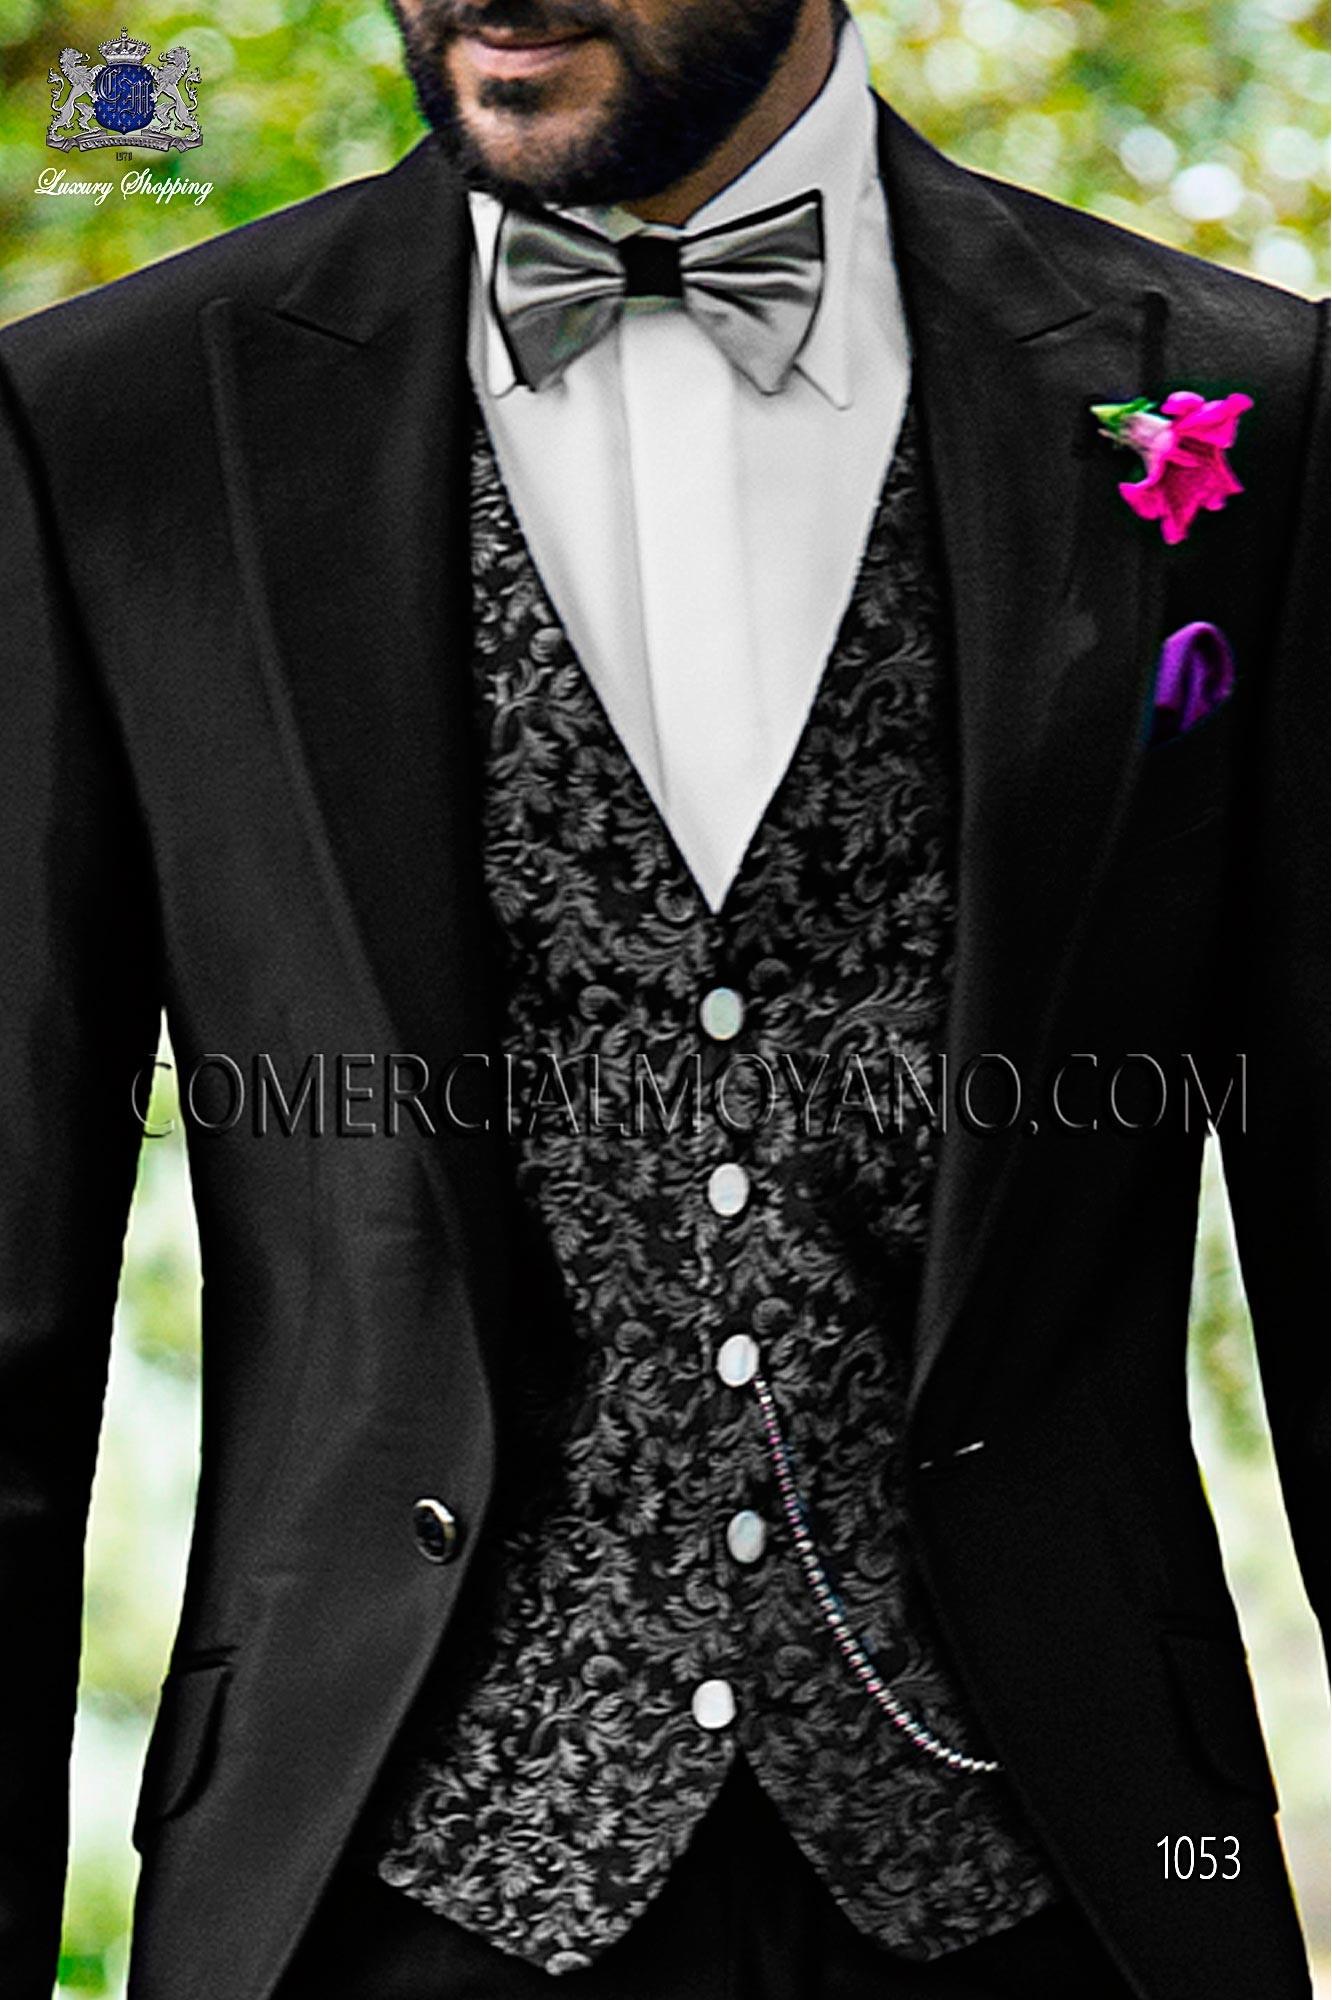 Italian fashion black men wedding suit, model: 1053 Ottavio Nuccio Gala Fashion Collection